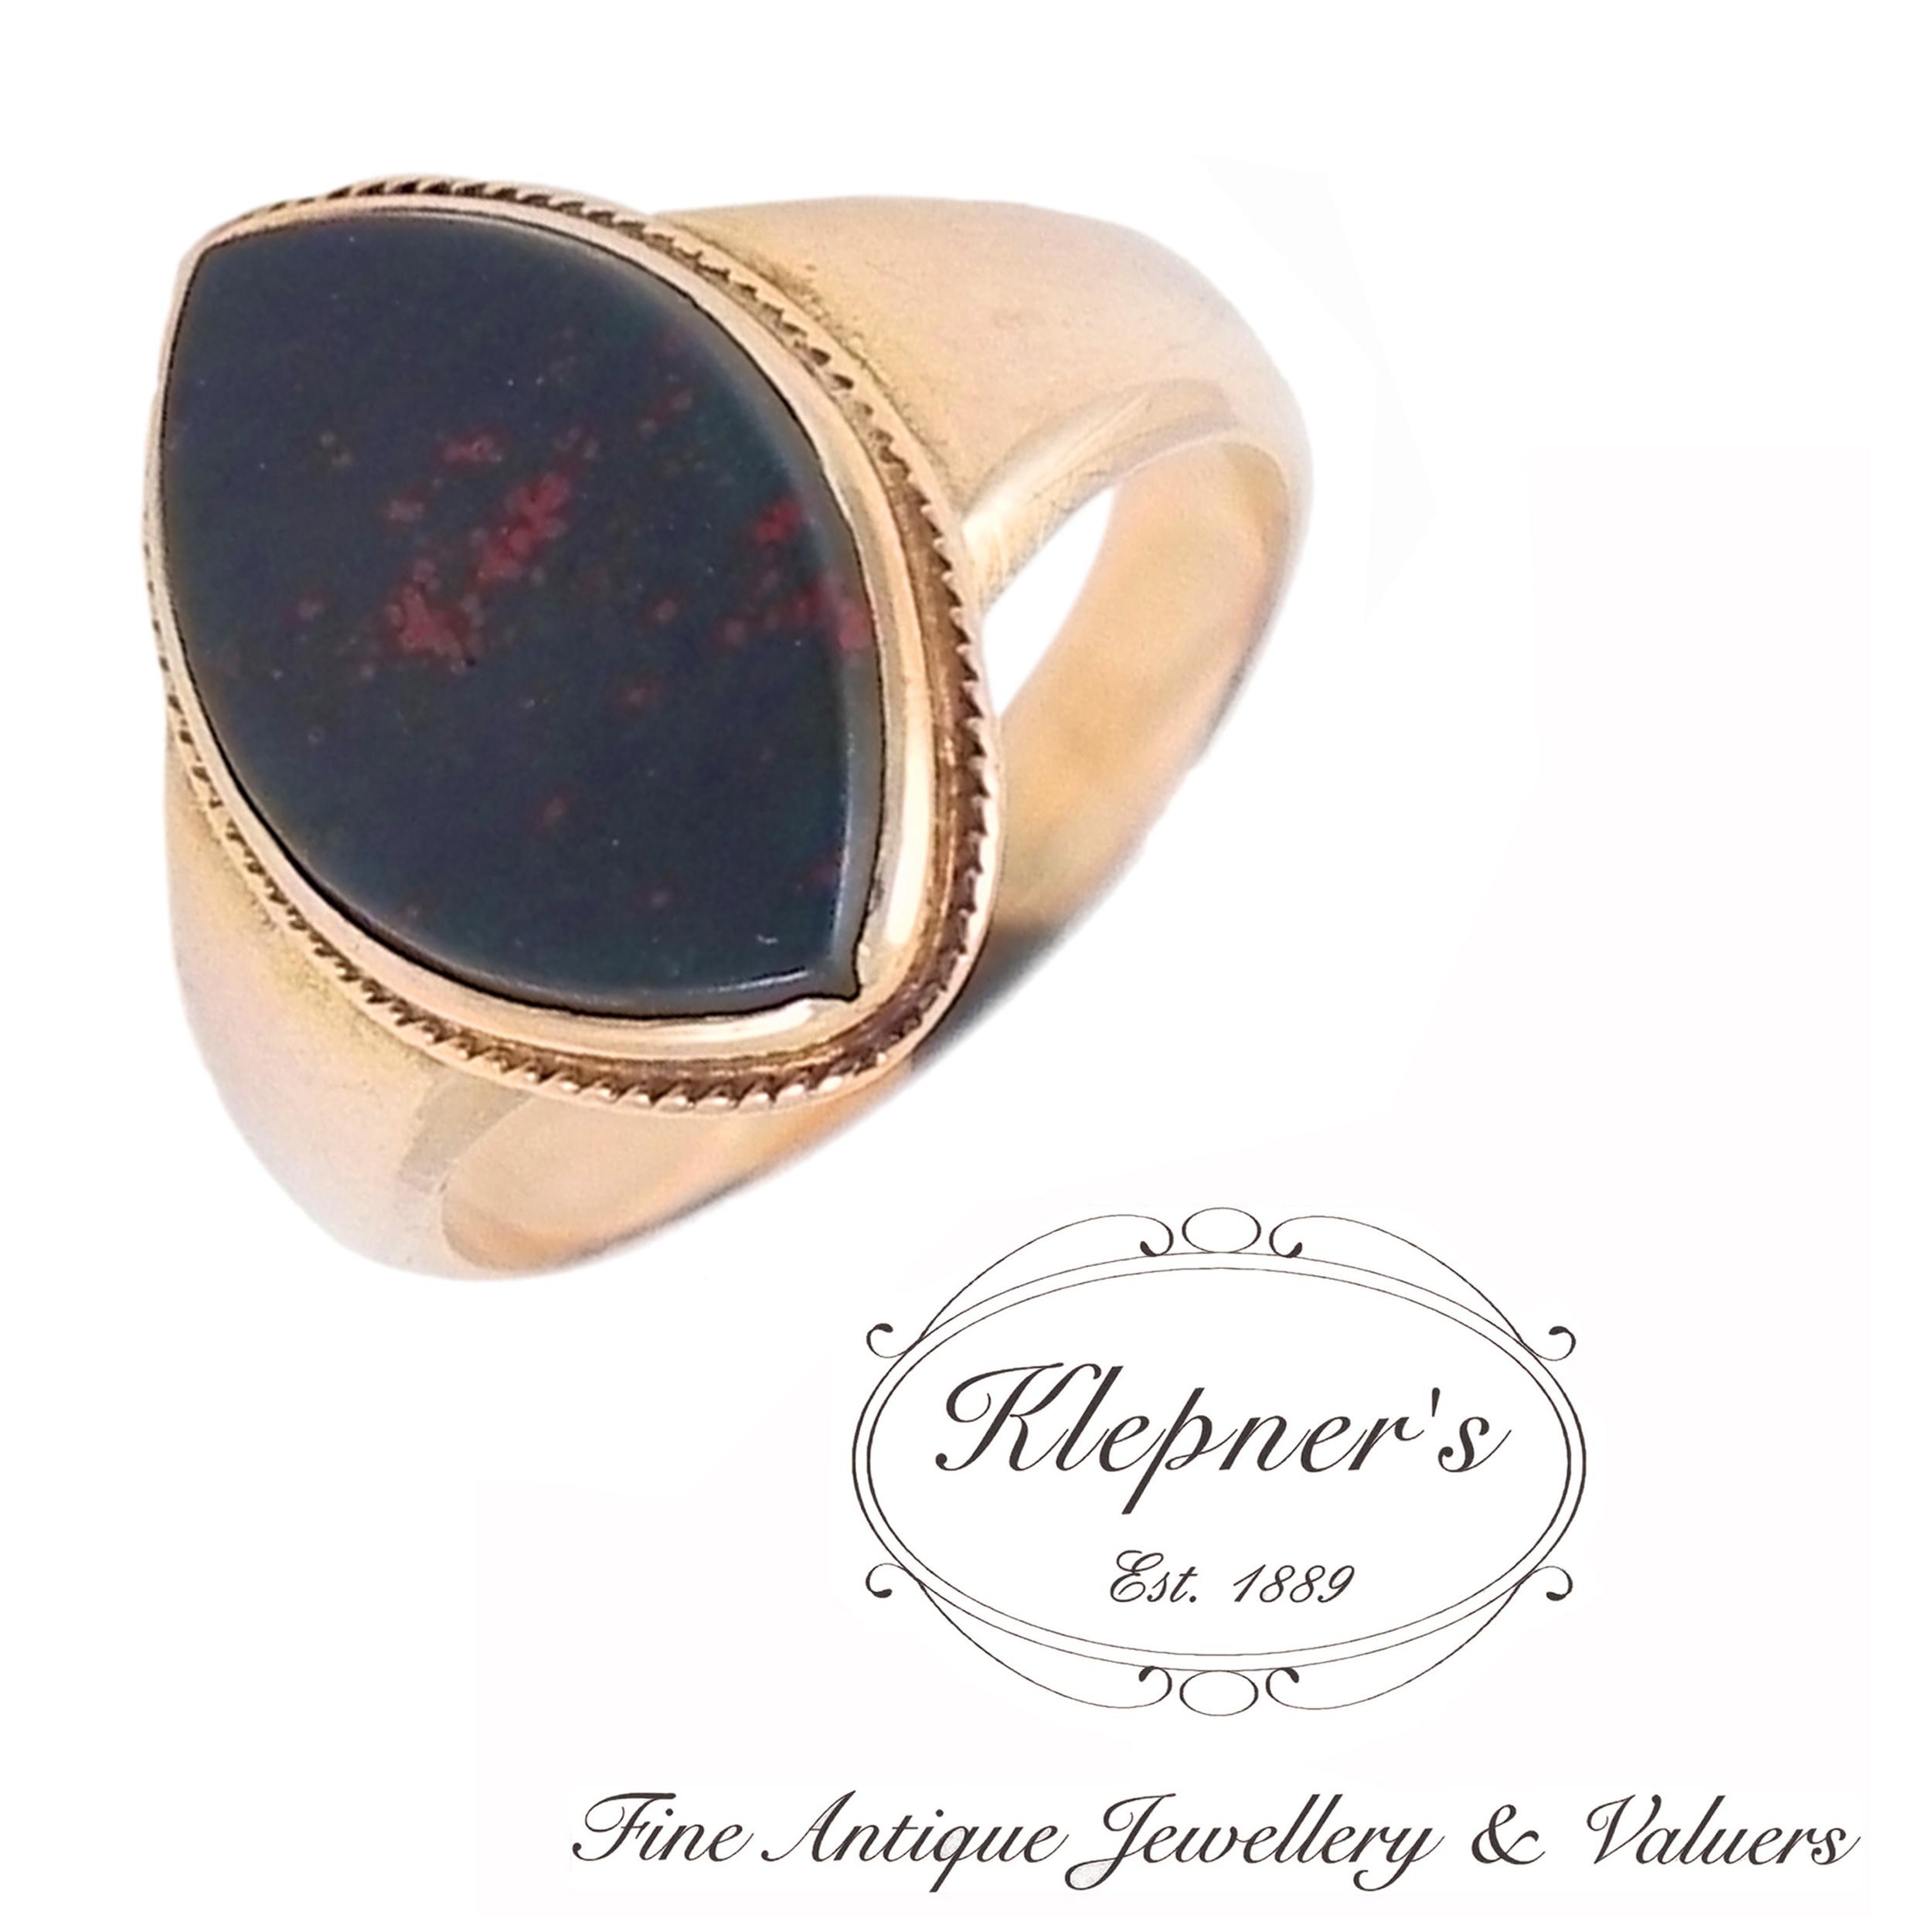 Birthstones — Klepner's Fine Antique Jewellery & Valuers